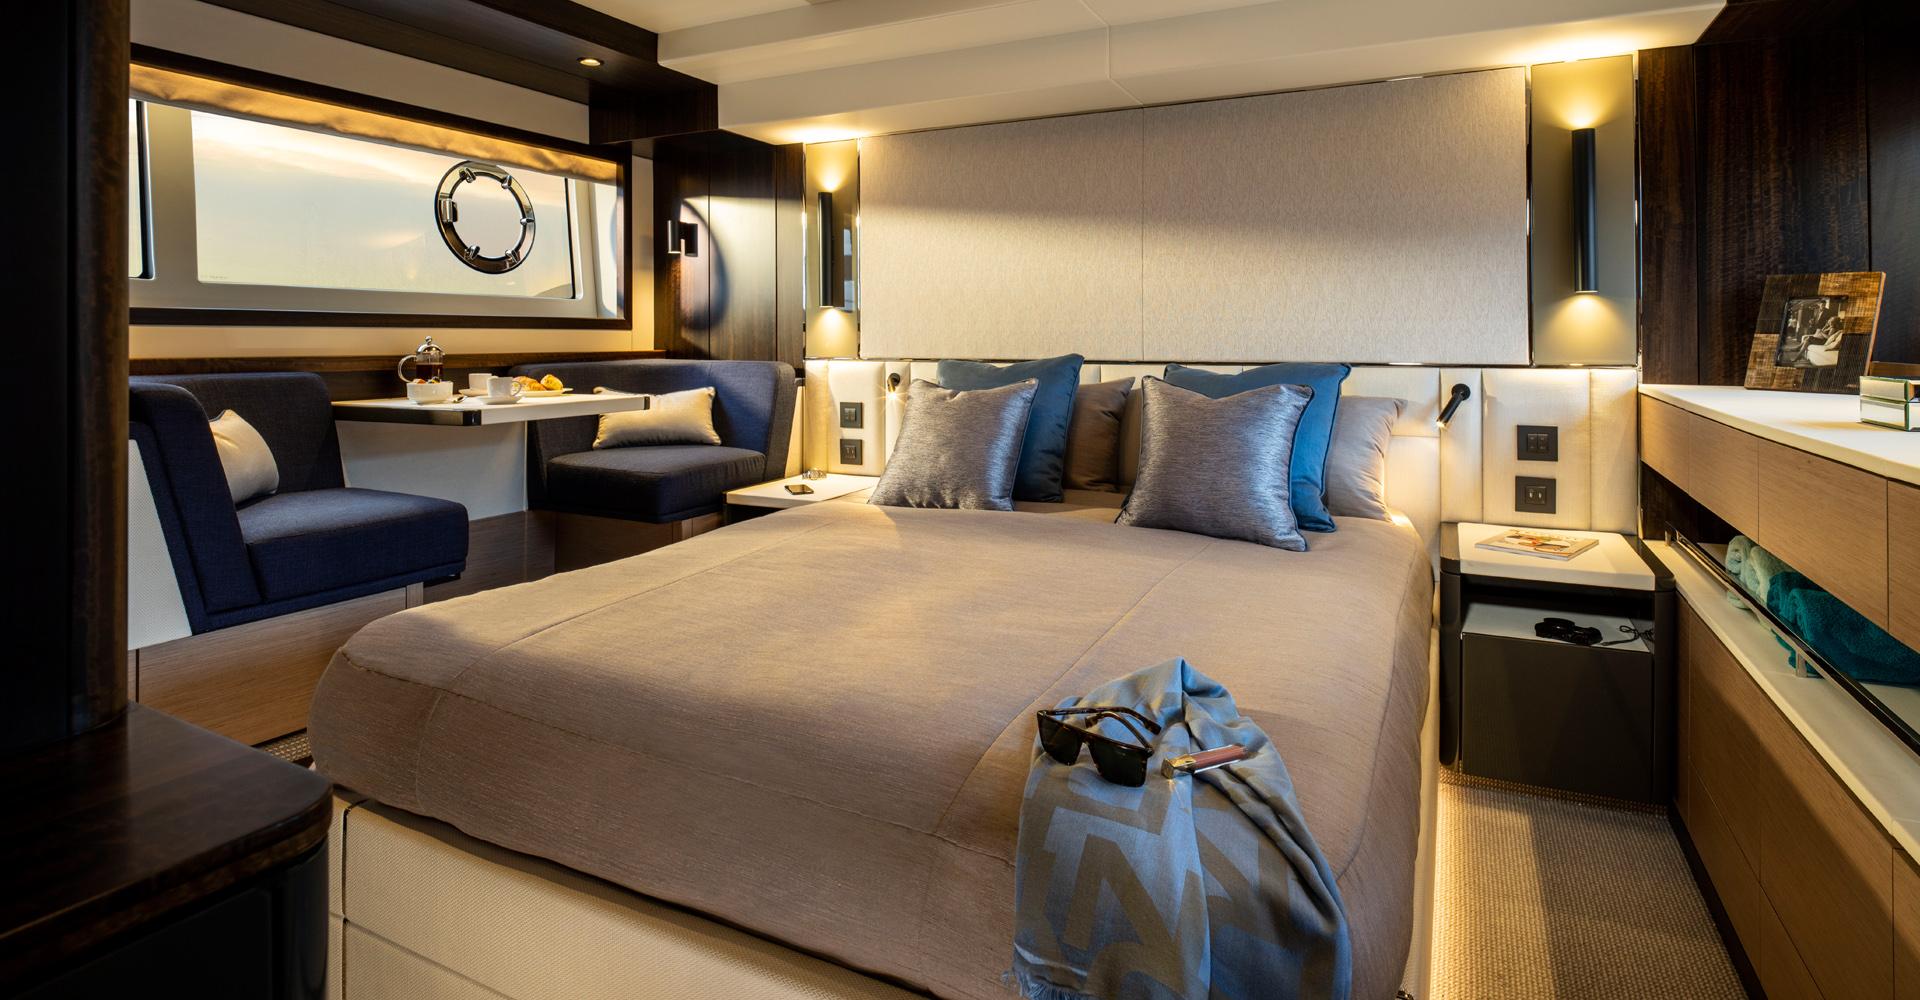 Sunseeker Manhatten 55 master cabin